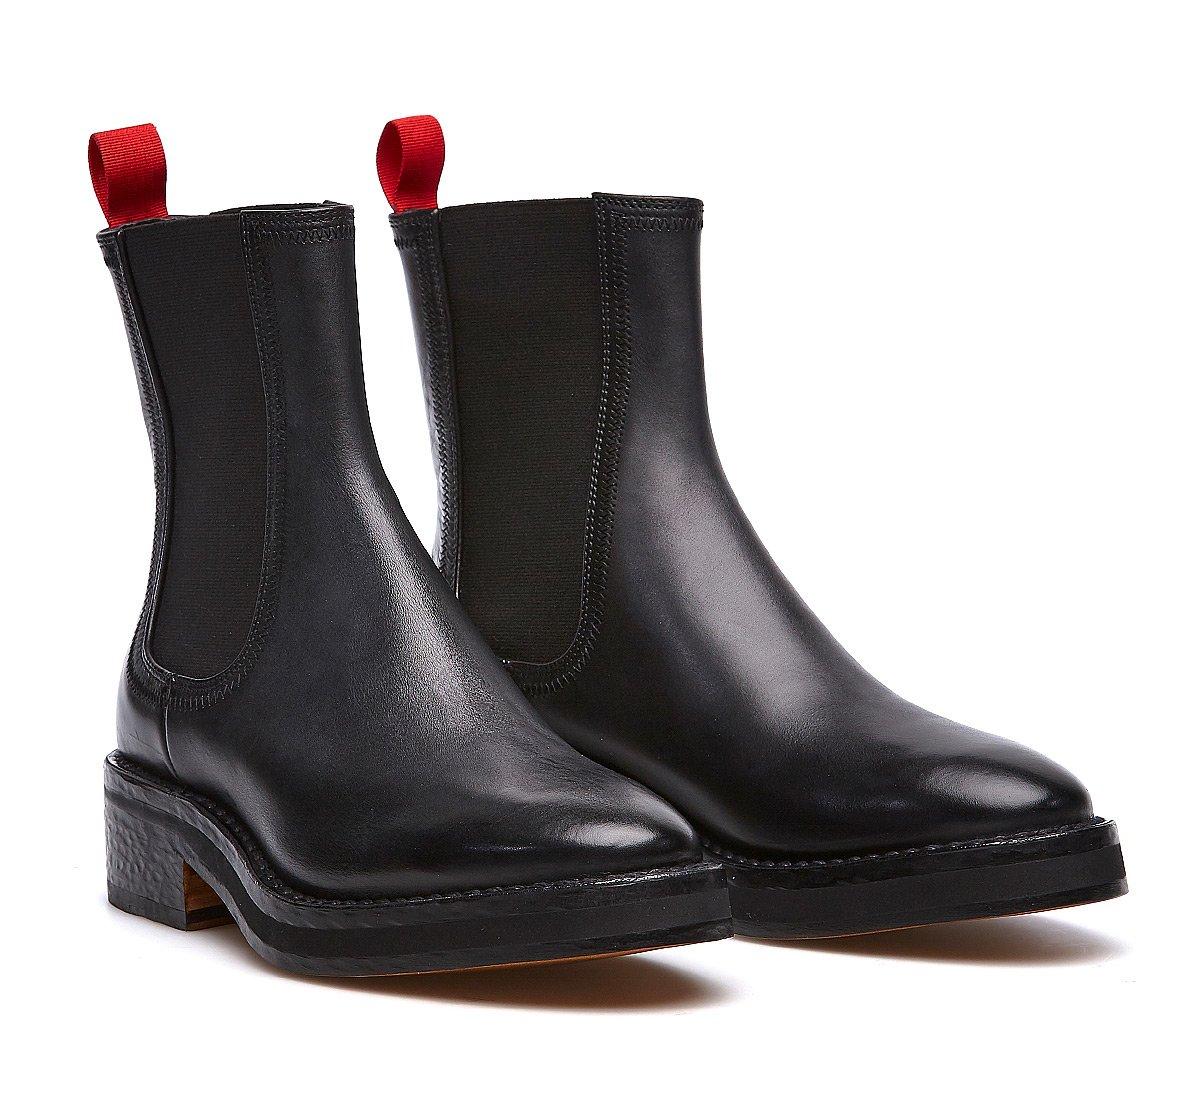 Total black Barracuda Beatle Boots